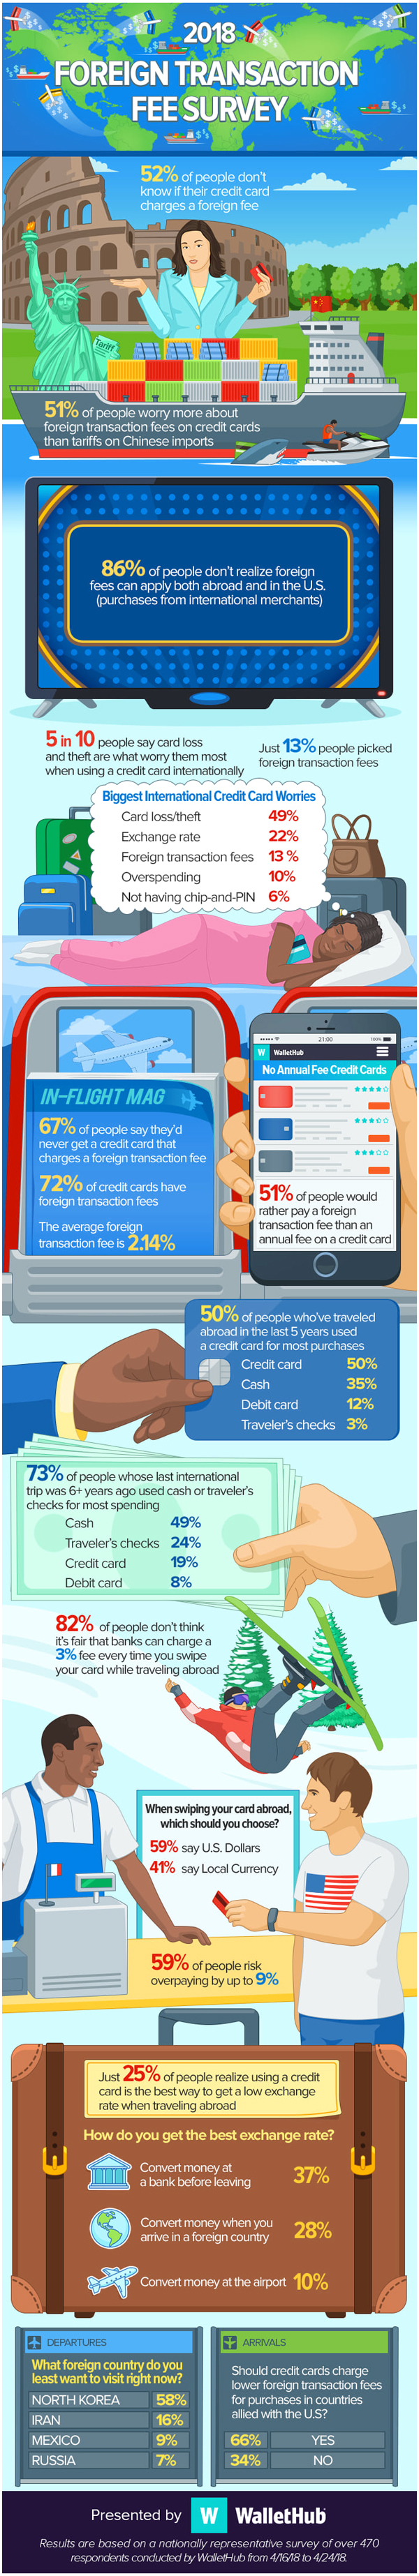 2018 Foreign Transaction Fee Survey